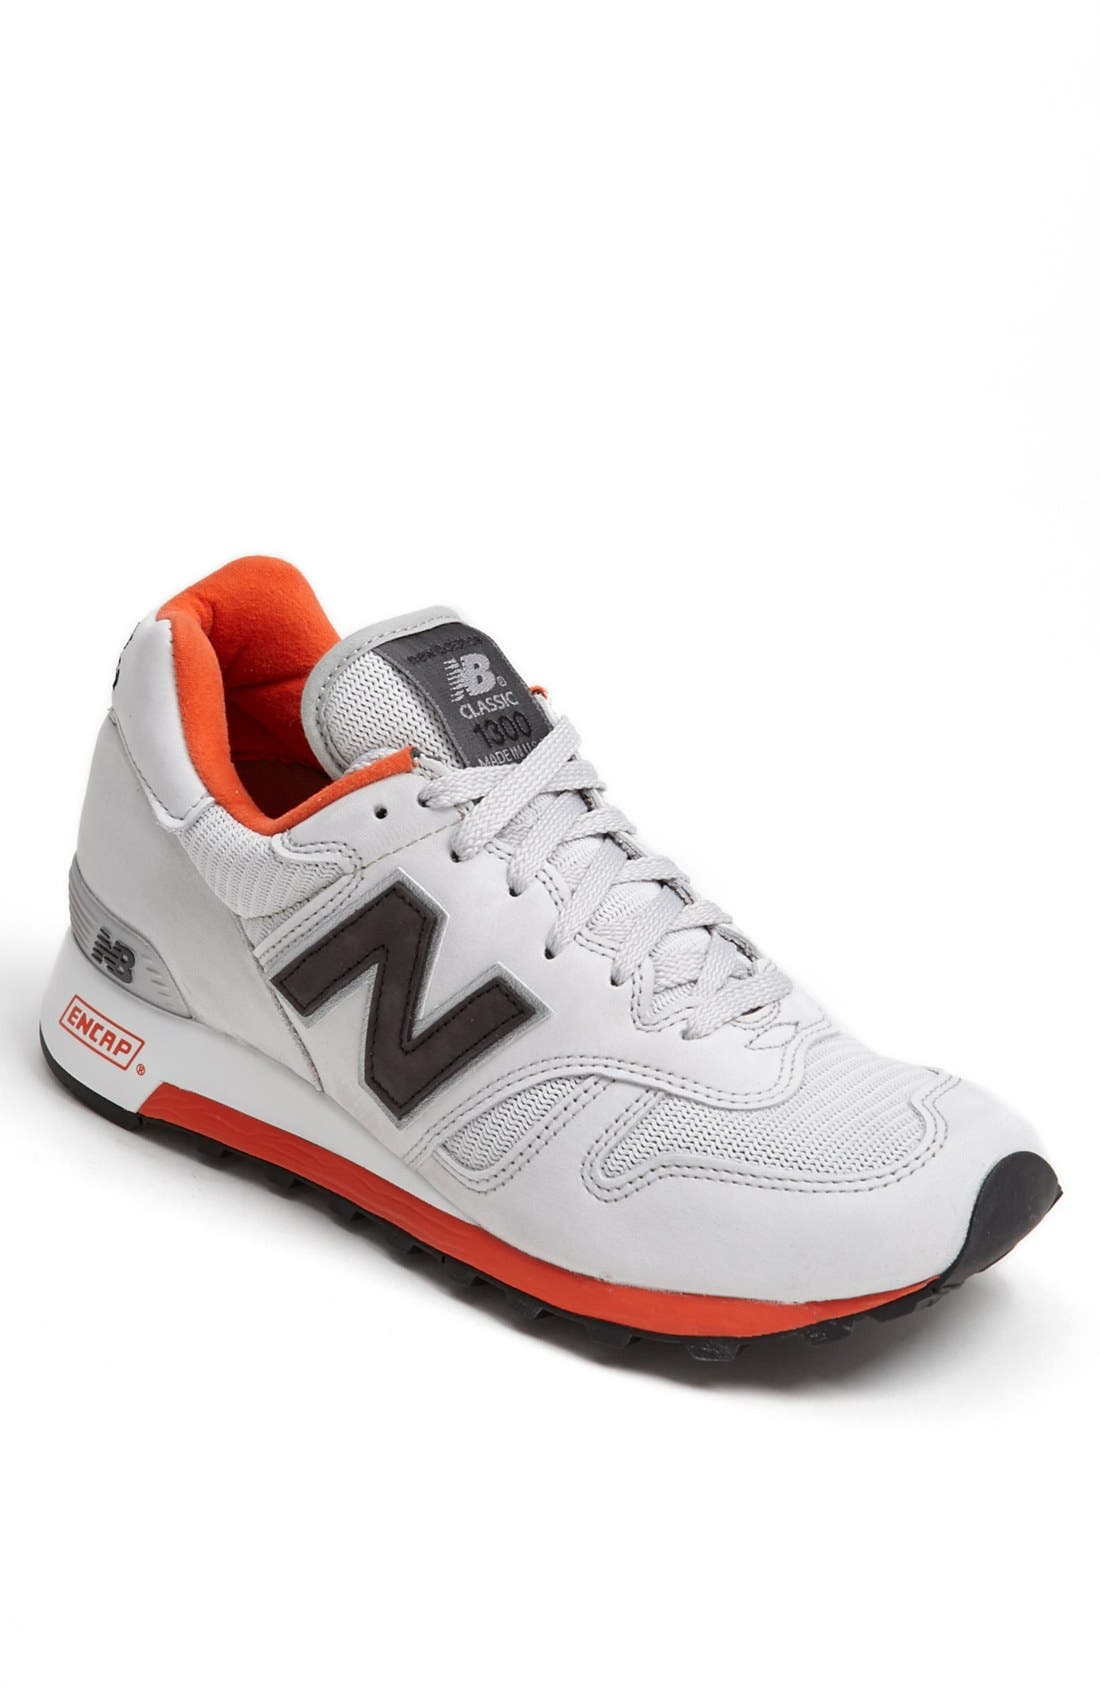 Alternate Image 1 Selected - New Balance '1300 Classic' Sneaker (Men)